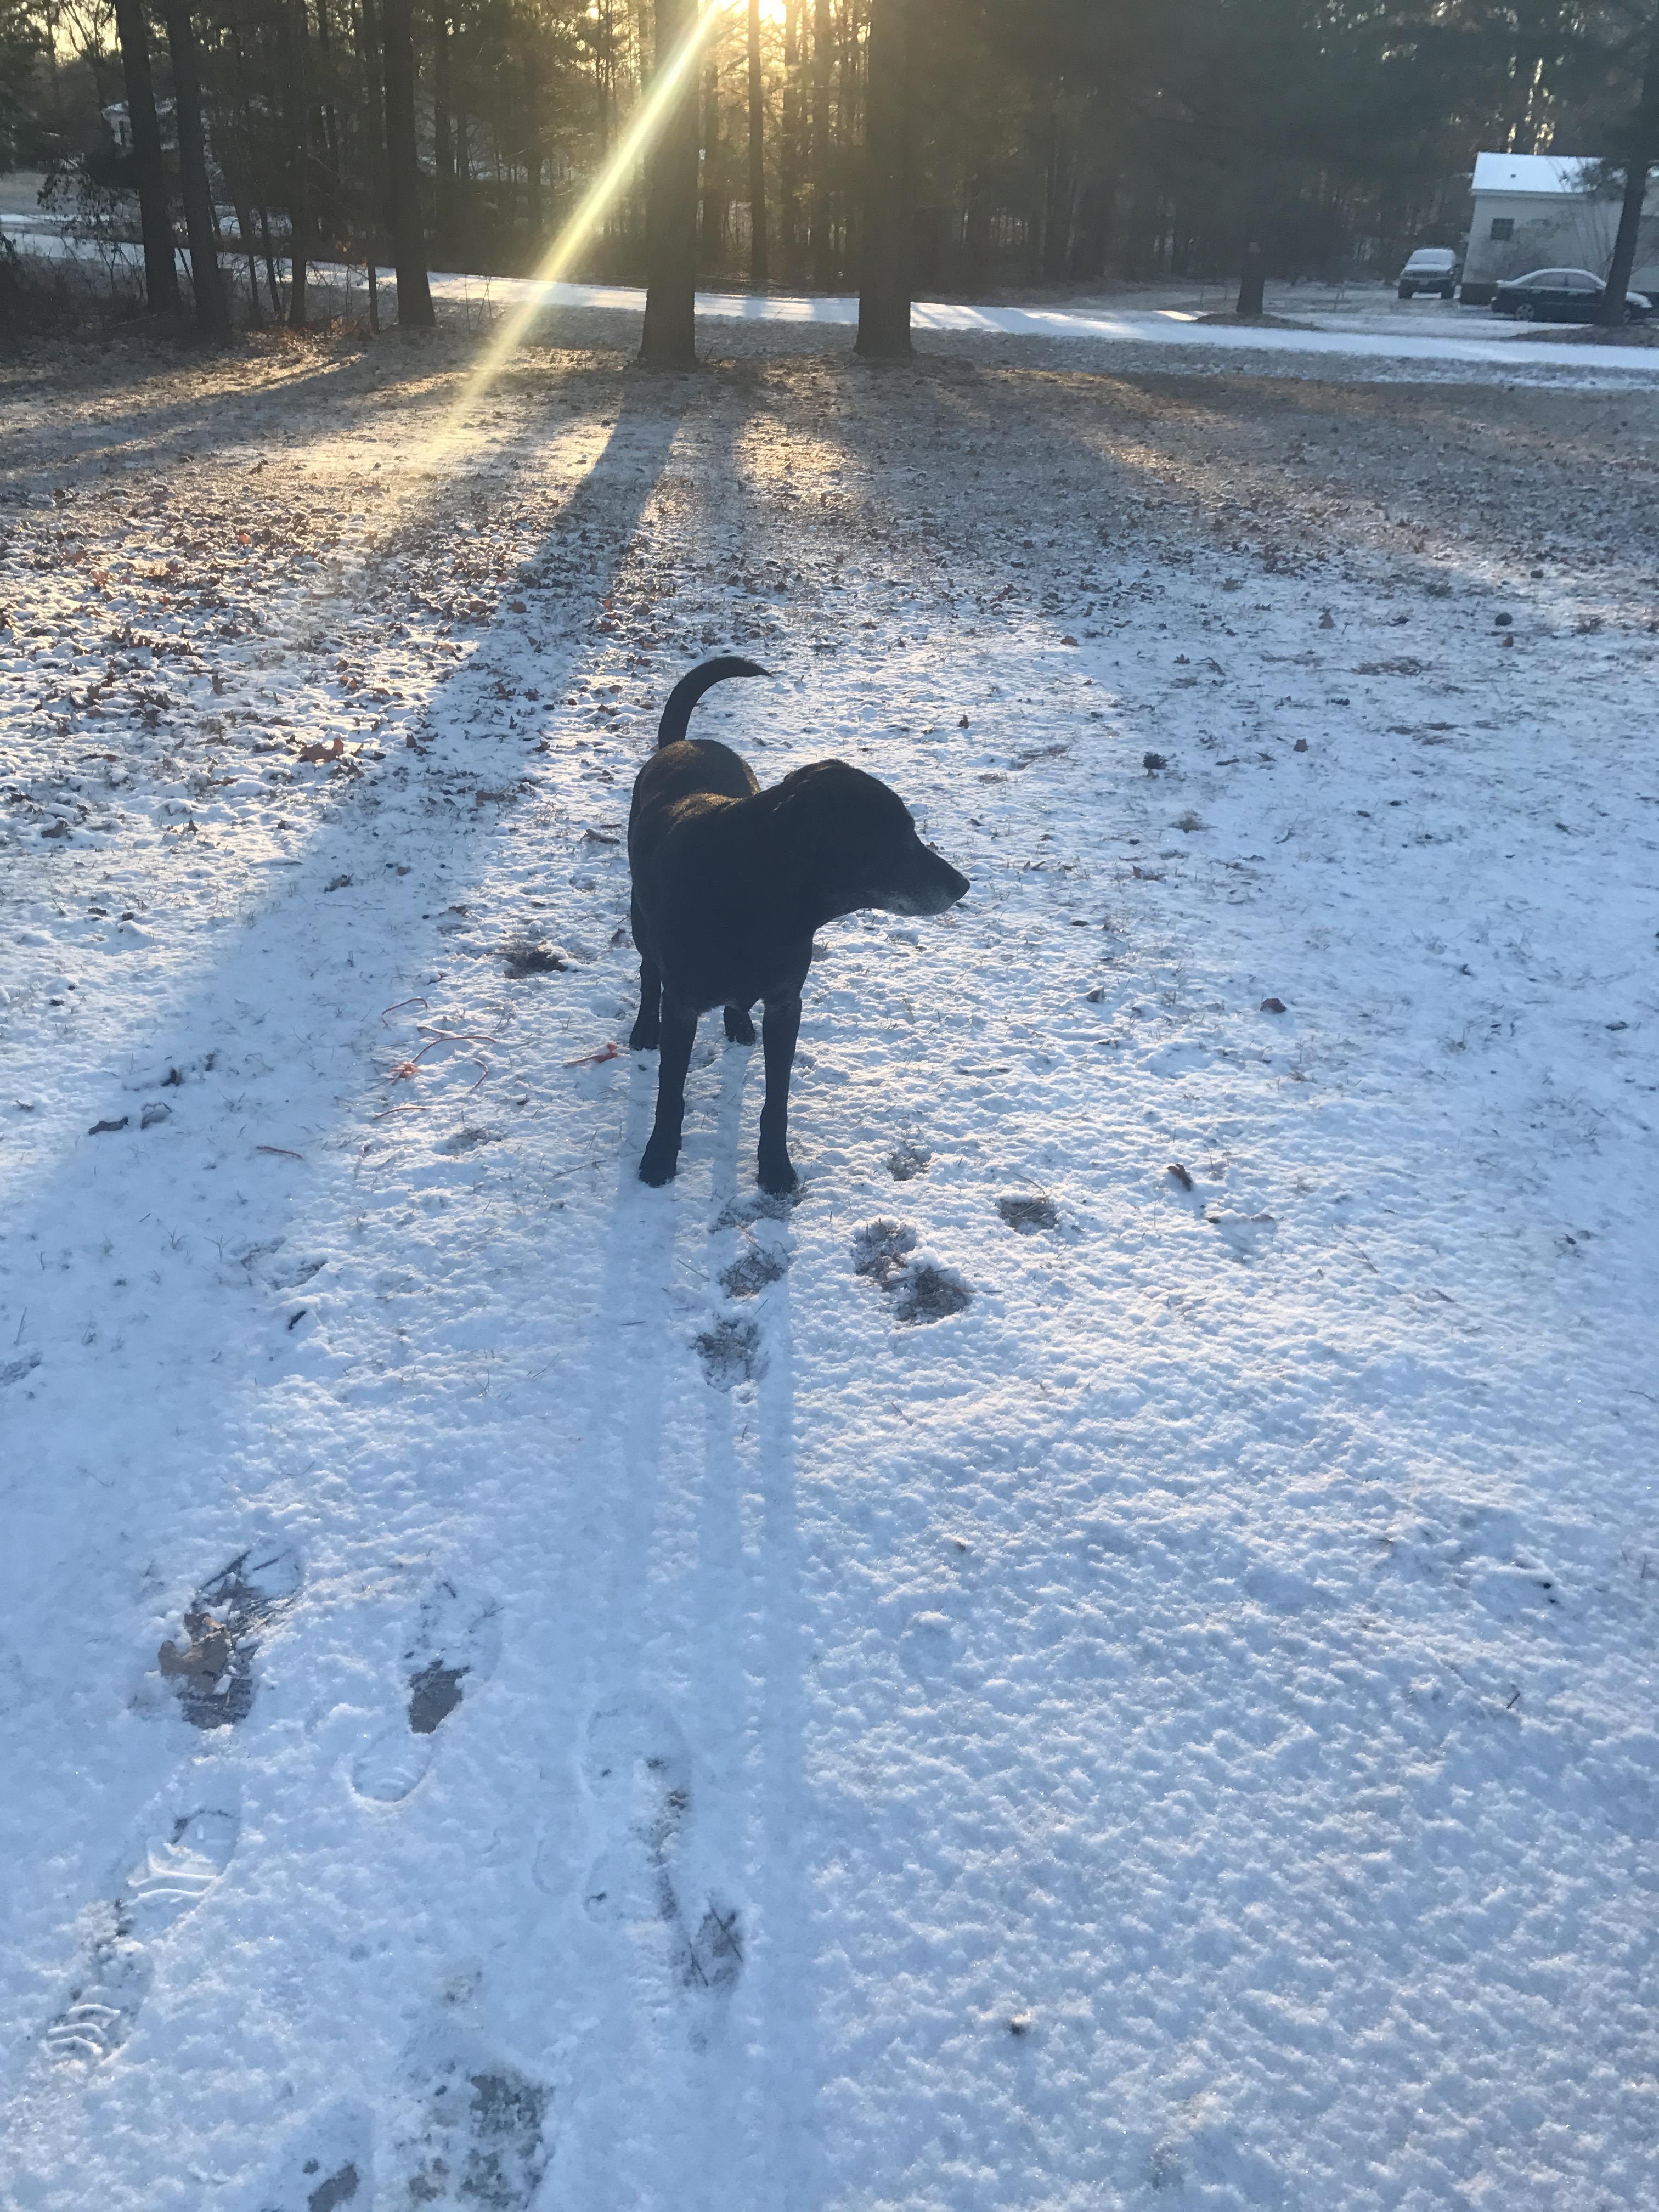 "<div class=""meta image-caption""><div class=""origin-logo origin-image wtvd""><span>WTVD</span></div><span class=""caption-text"">Lab playing in snow saying hi from lovingpaws dog boarding/walking in Garner. (Sarah - ABC11 Eyewitness)</span></div>"